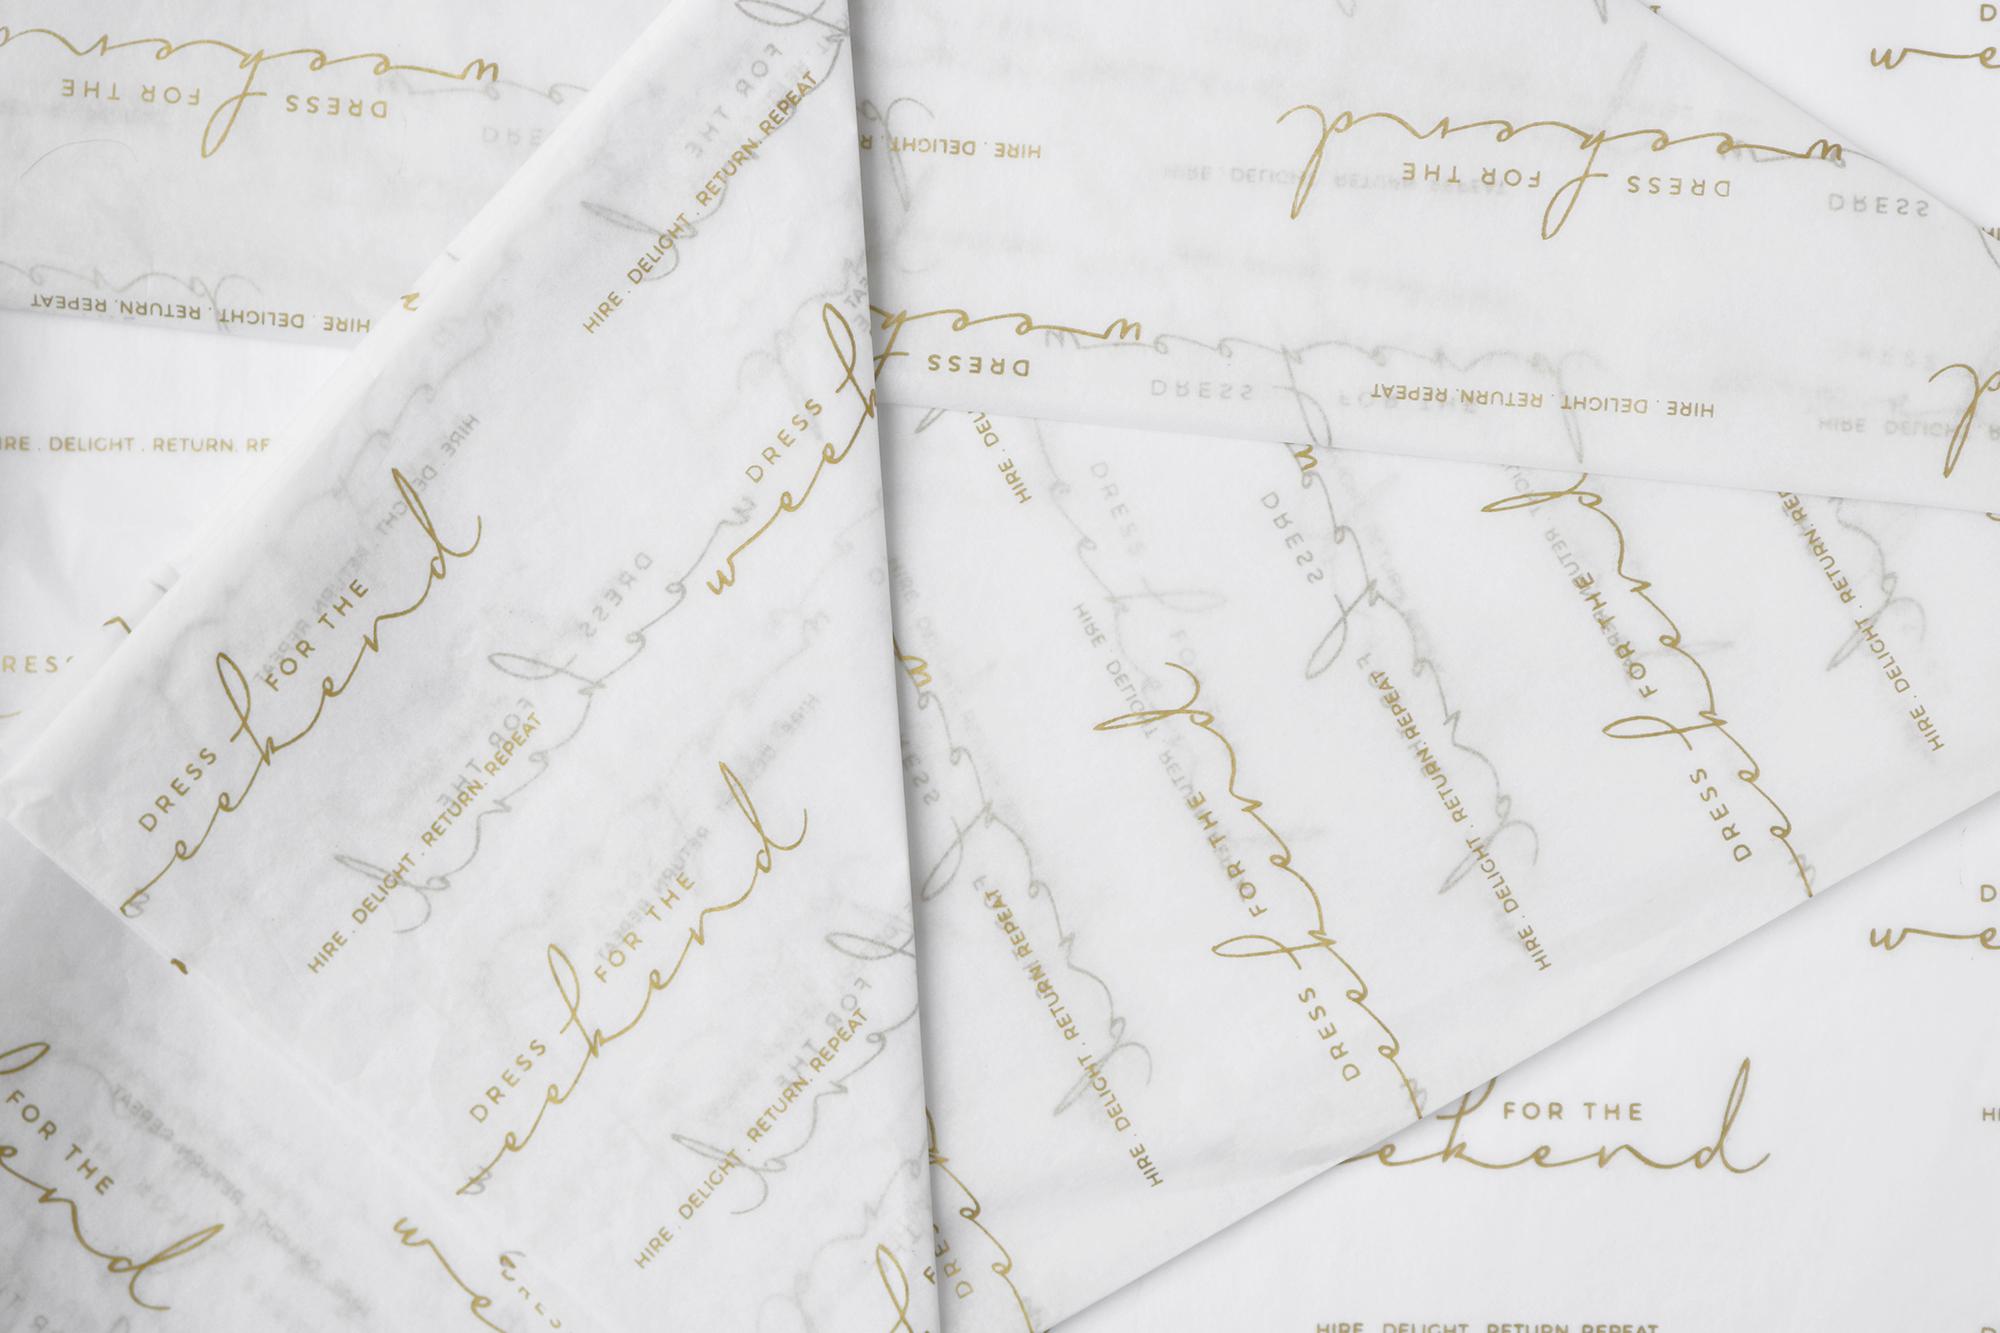 DFTW Tissue Paper Design + Gold PMS